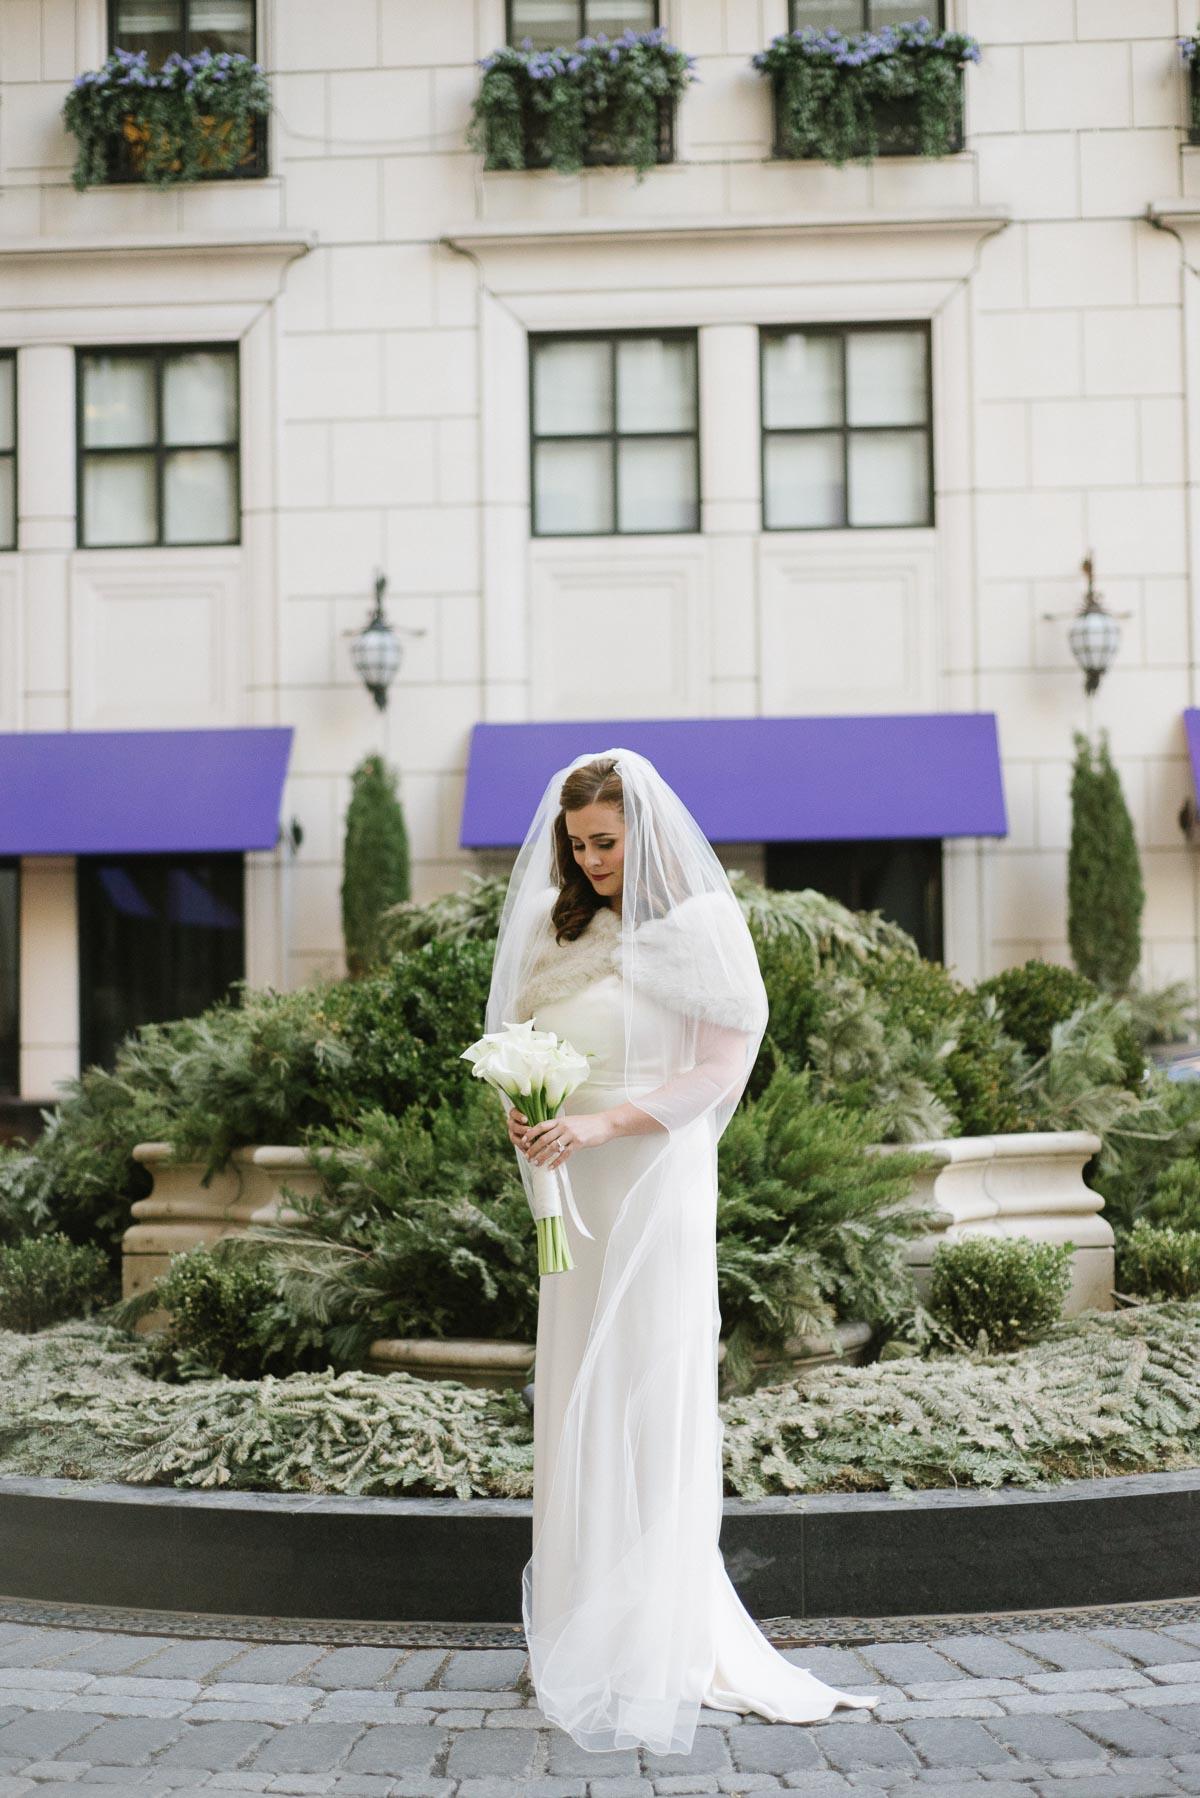 Pamela Yasuko Photography - A New Leaf Wedding - Chicago Oahu Photographer-13.jpg